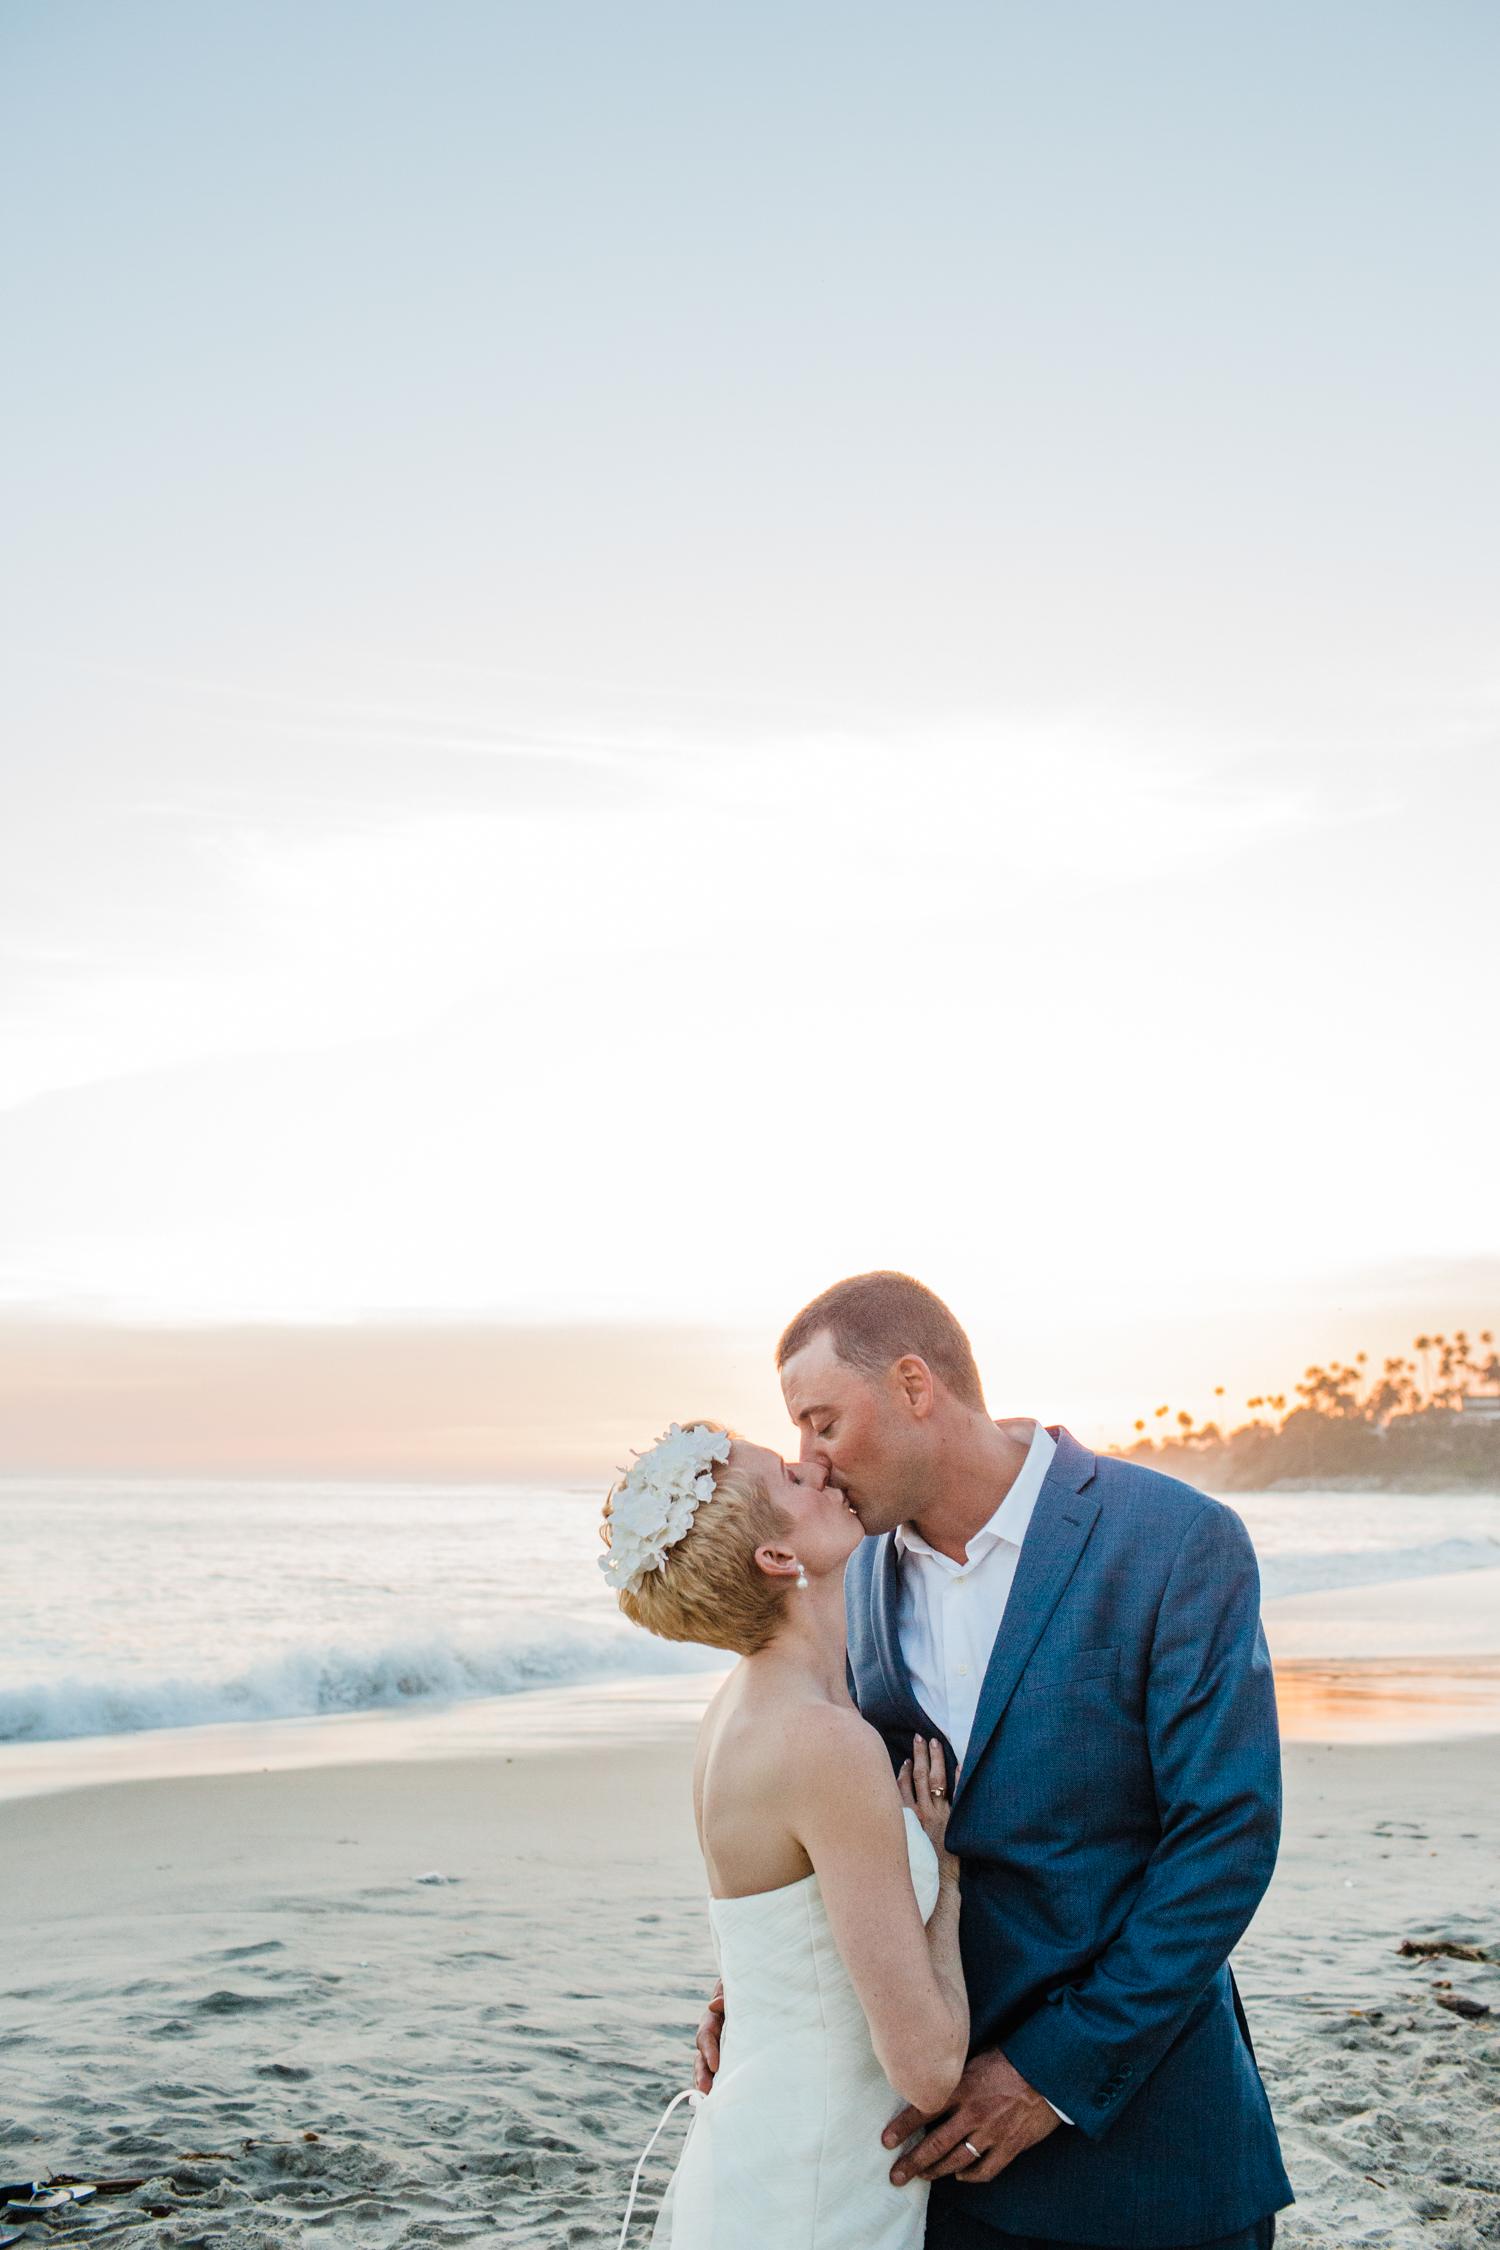 casey-brodley-michigan-midwest-grand-rapids-wedding-photographer.jpg